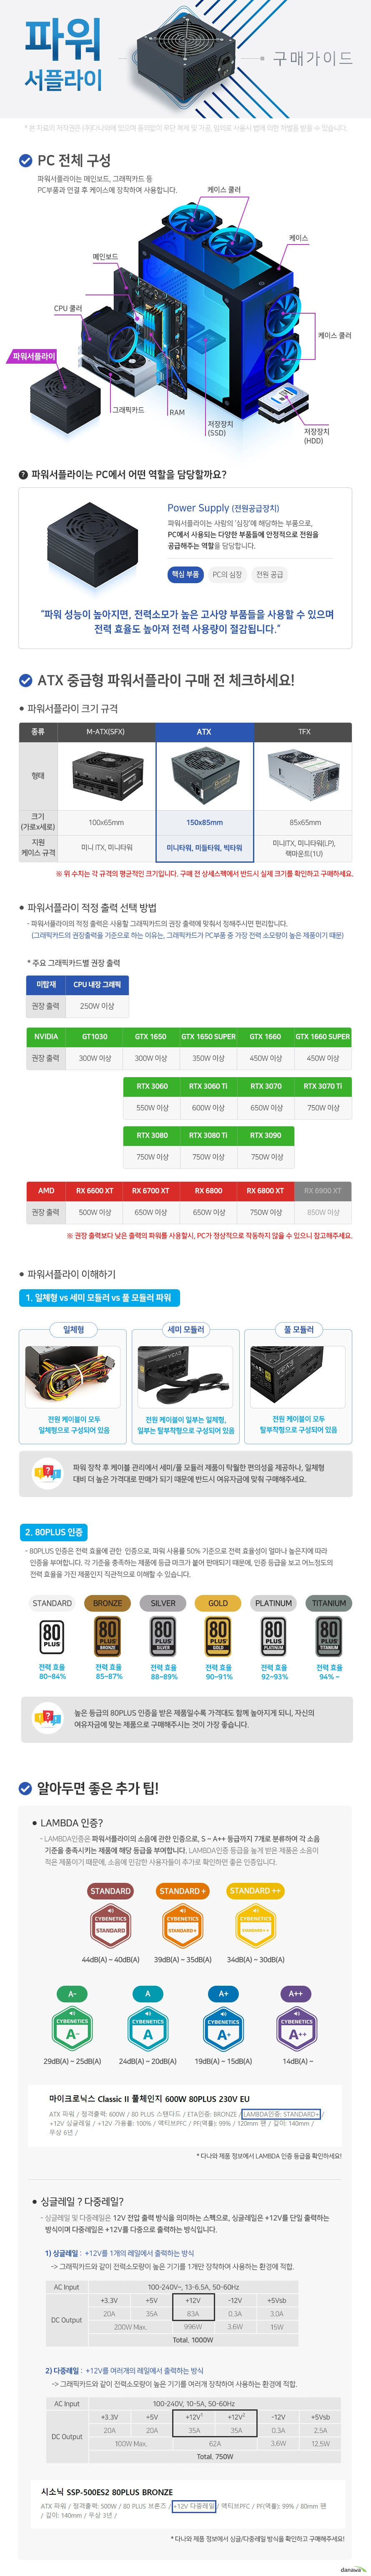 FSP HYPER K PRO 700W 80PLUS Standard 230V EU